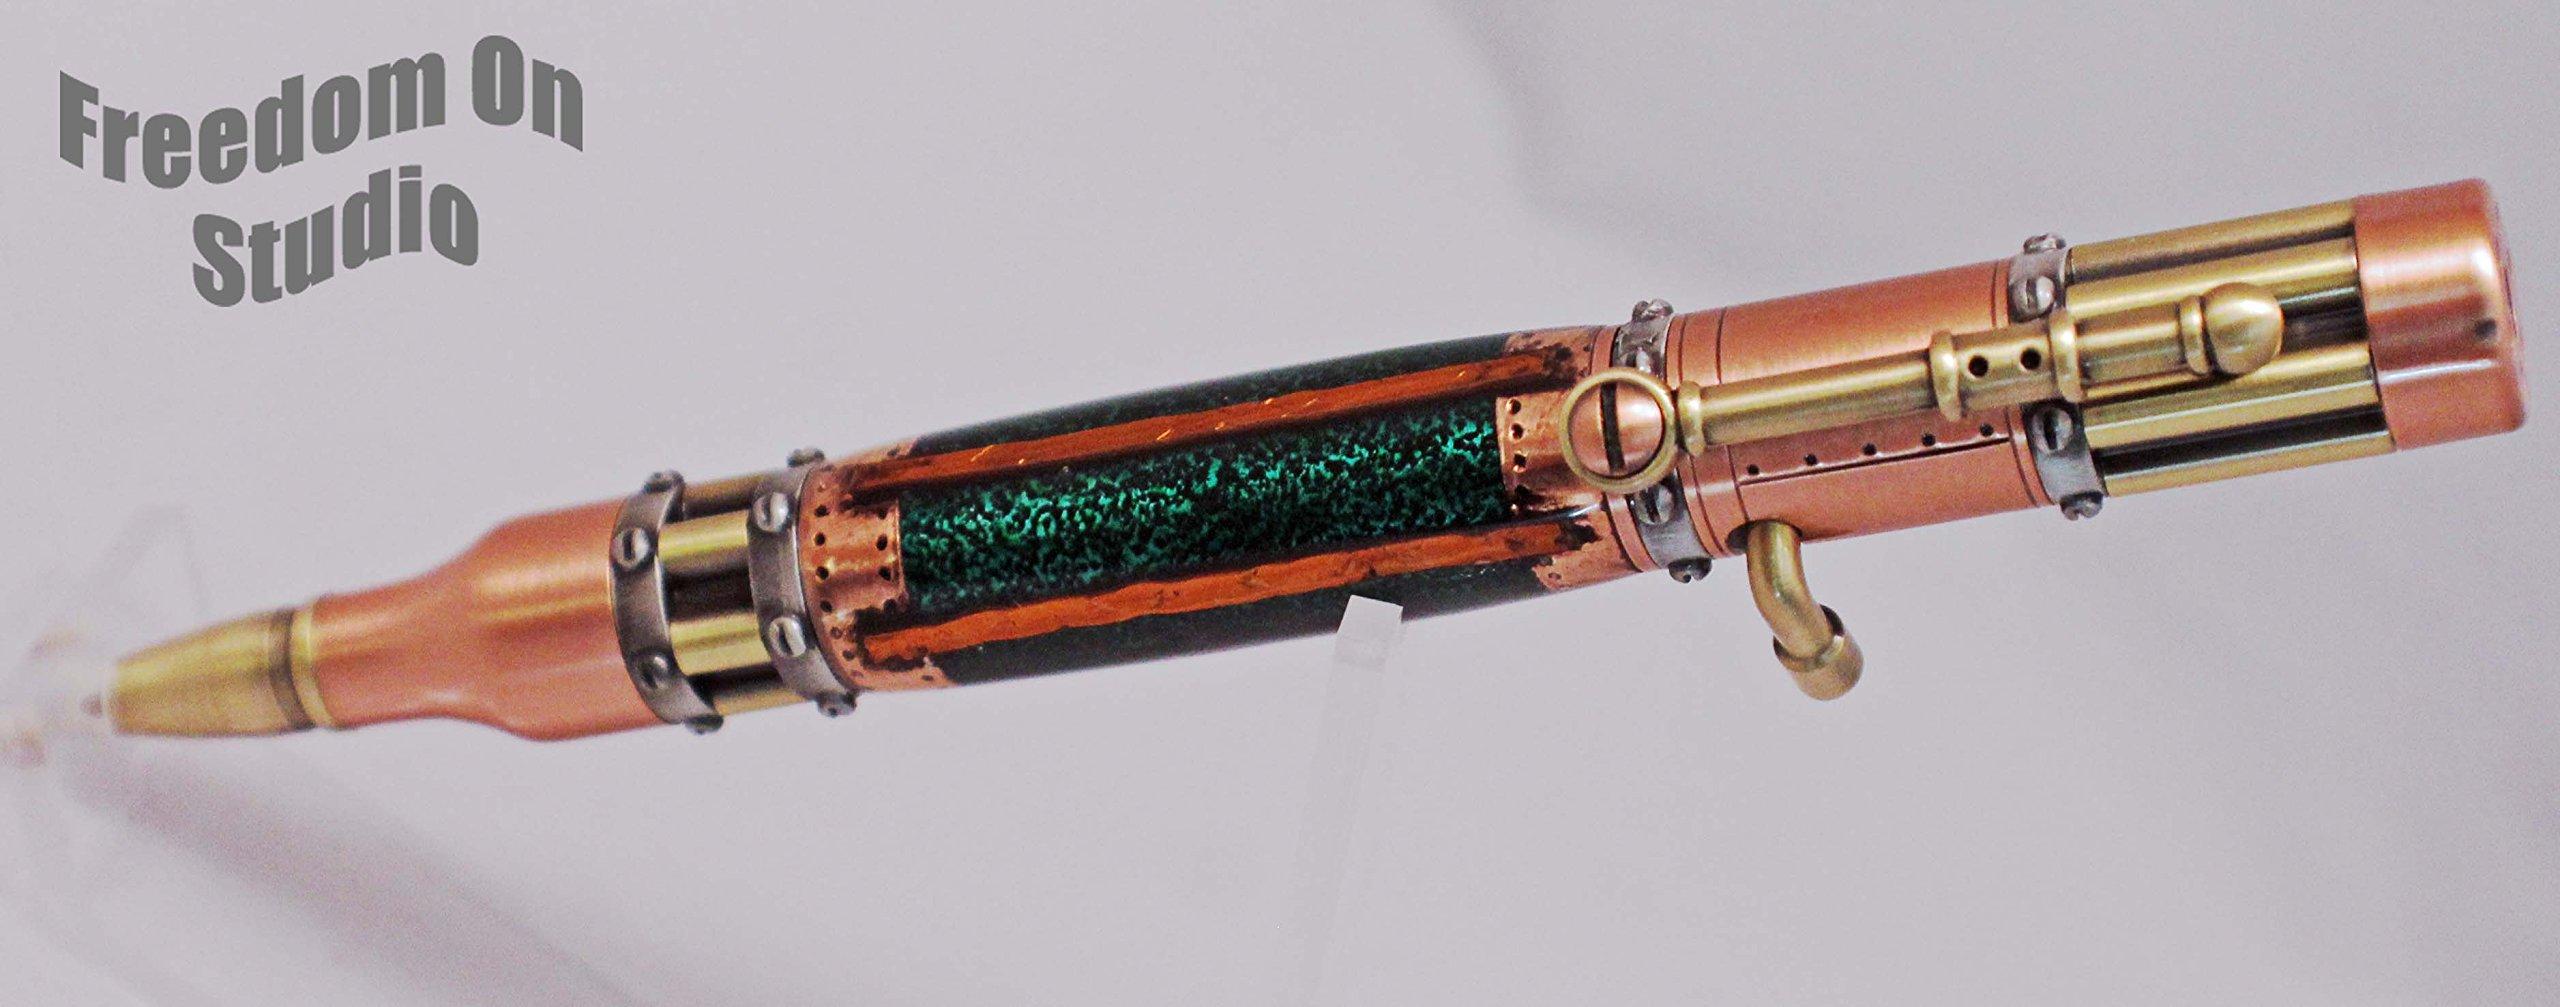 Hand Crafted Bolt Action Steampunk Pen - Green Mechanical